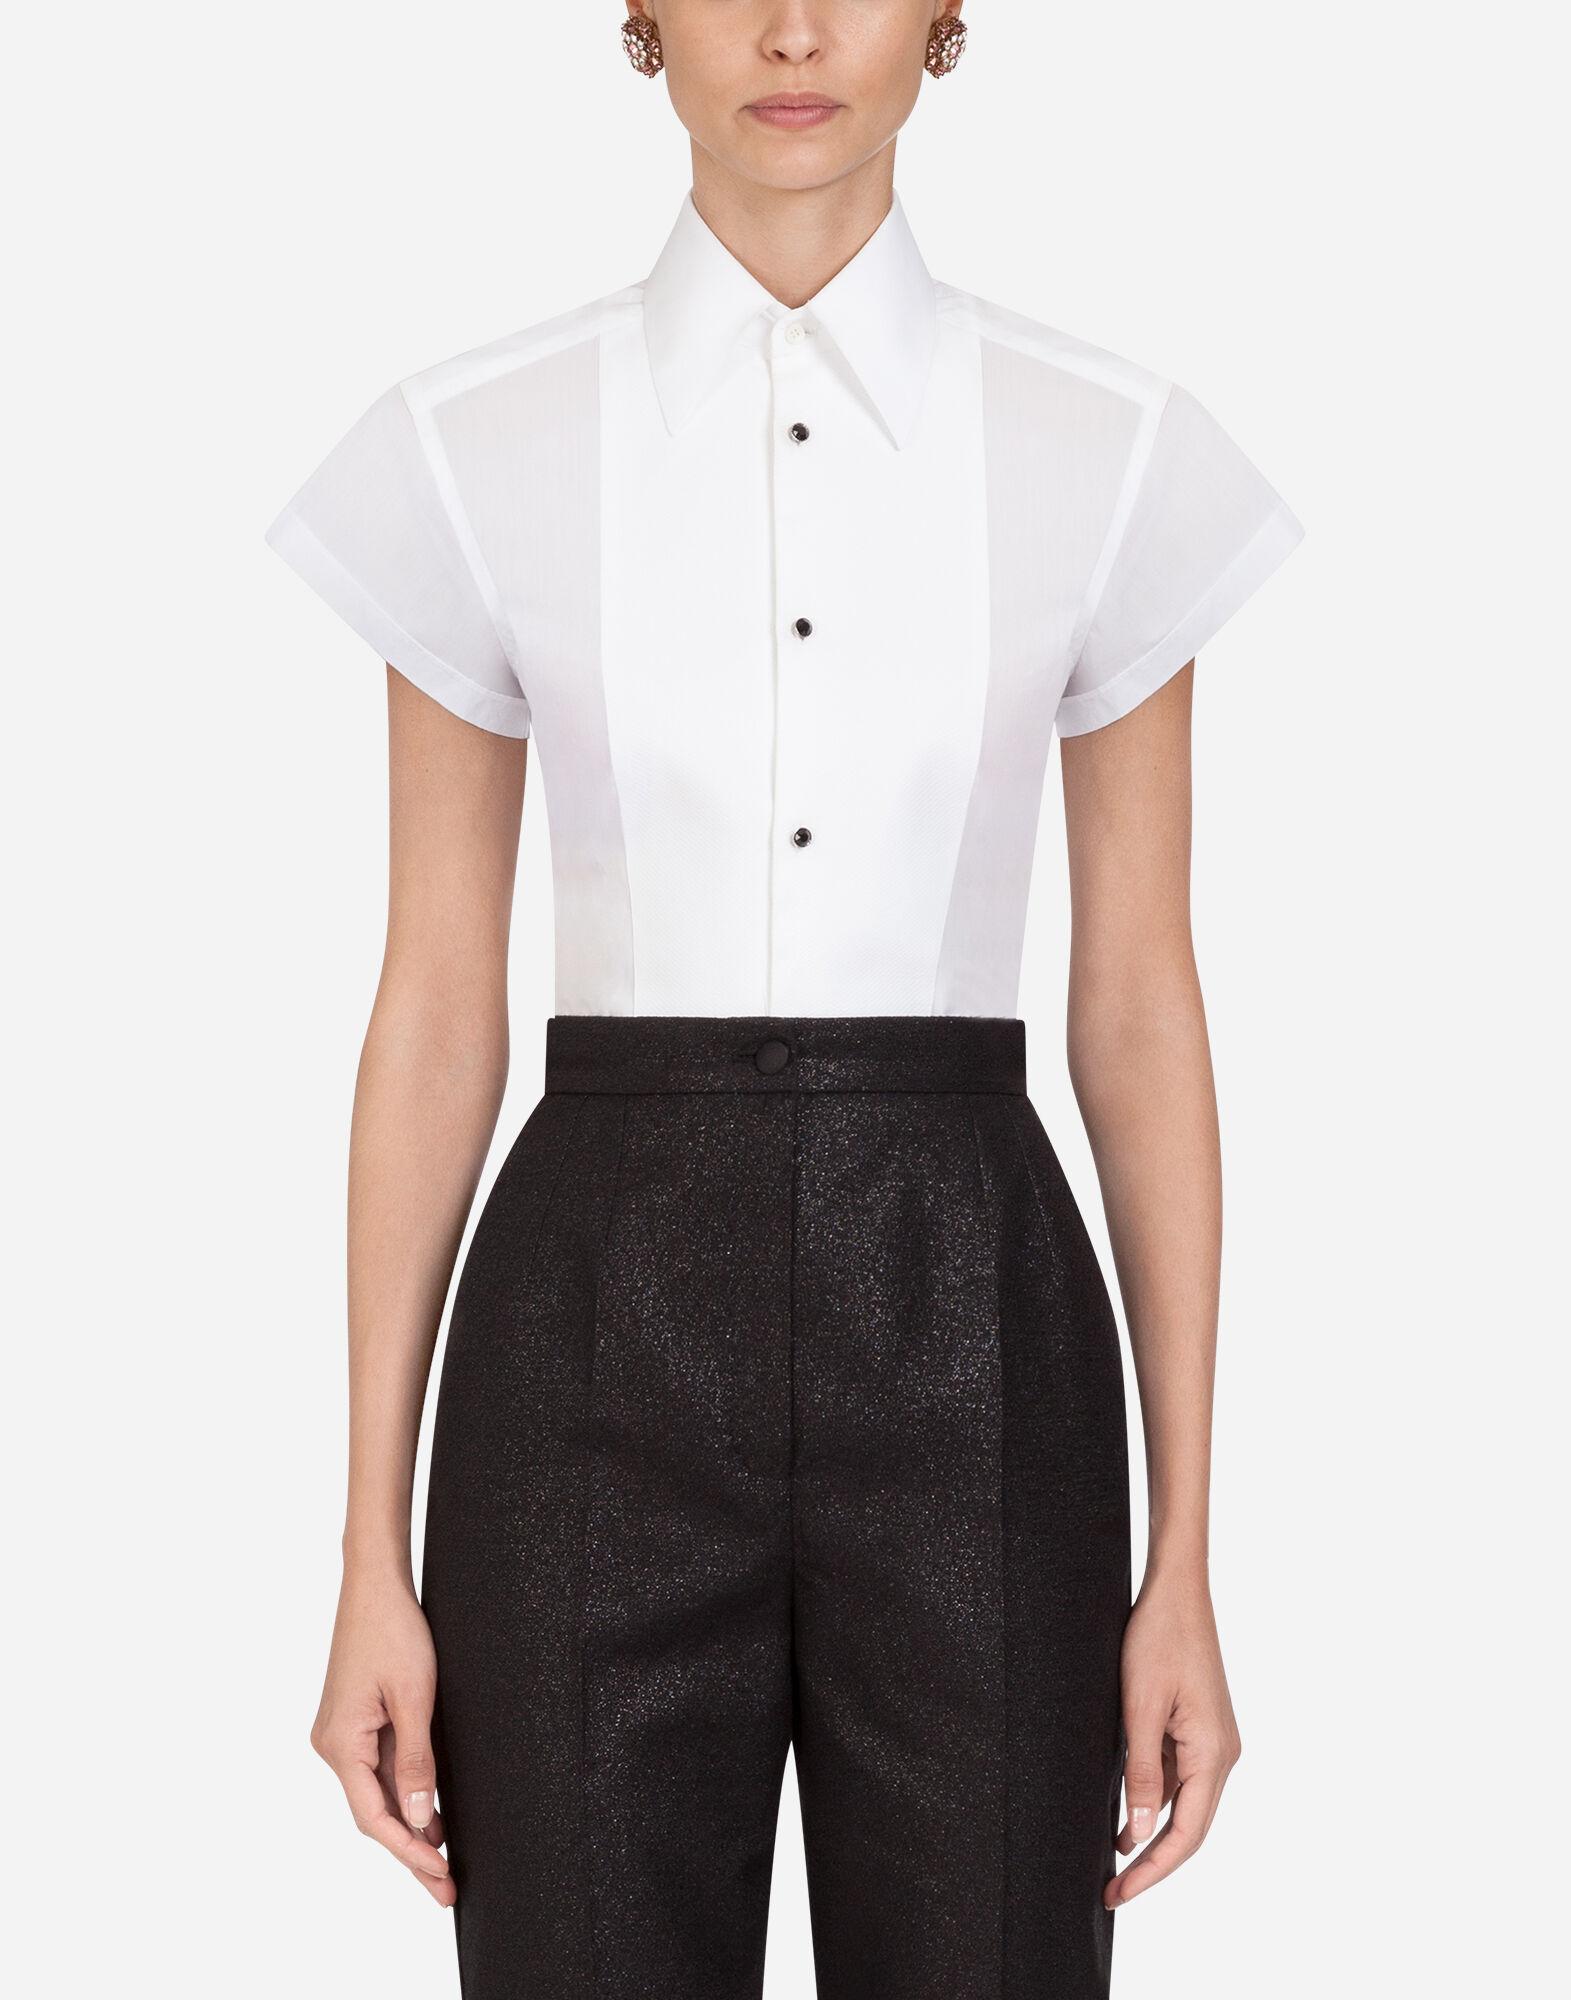 Femme Manches 3//4 Popeline Chemisier-Bureau Smart Casual Wear